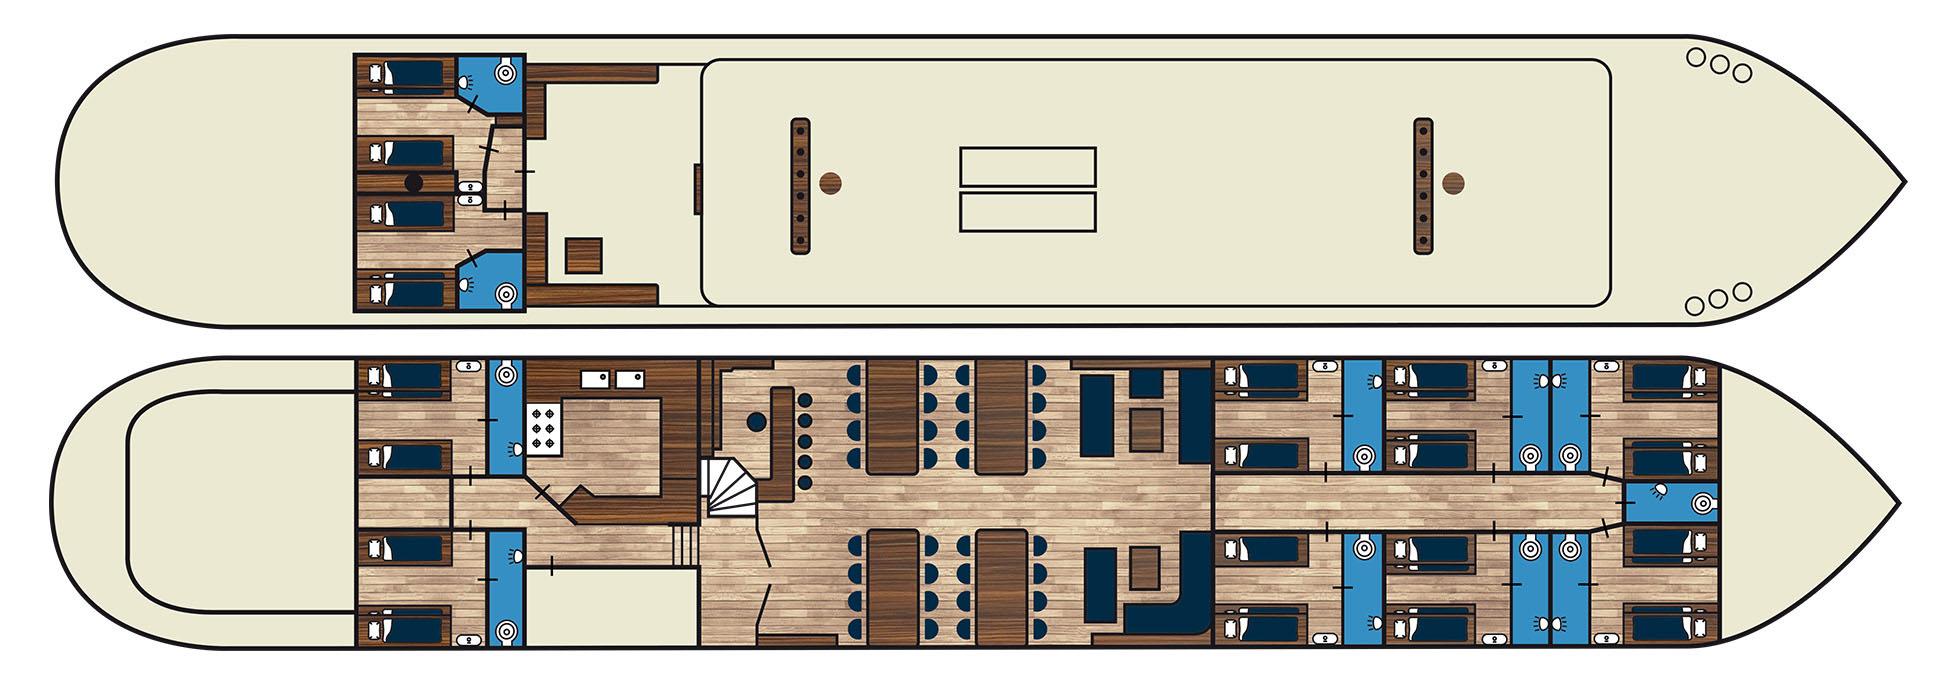 Schiff mieten auf IJsselmeer oder Wattenmeer : die Zeeuwse Klipper Elizabeth ab Lemmer